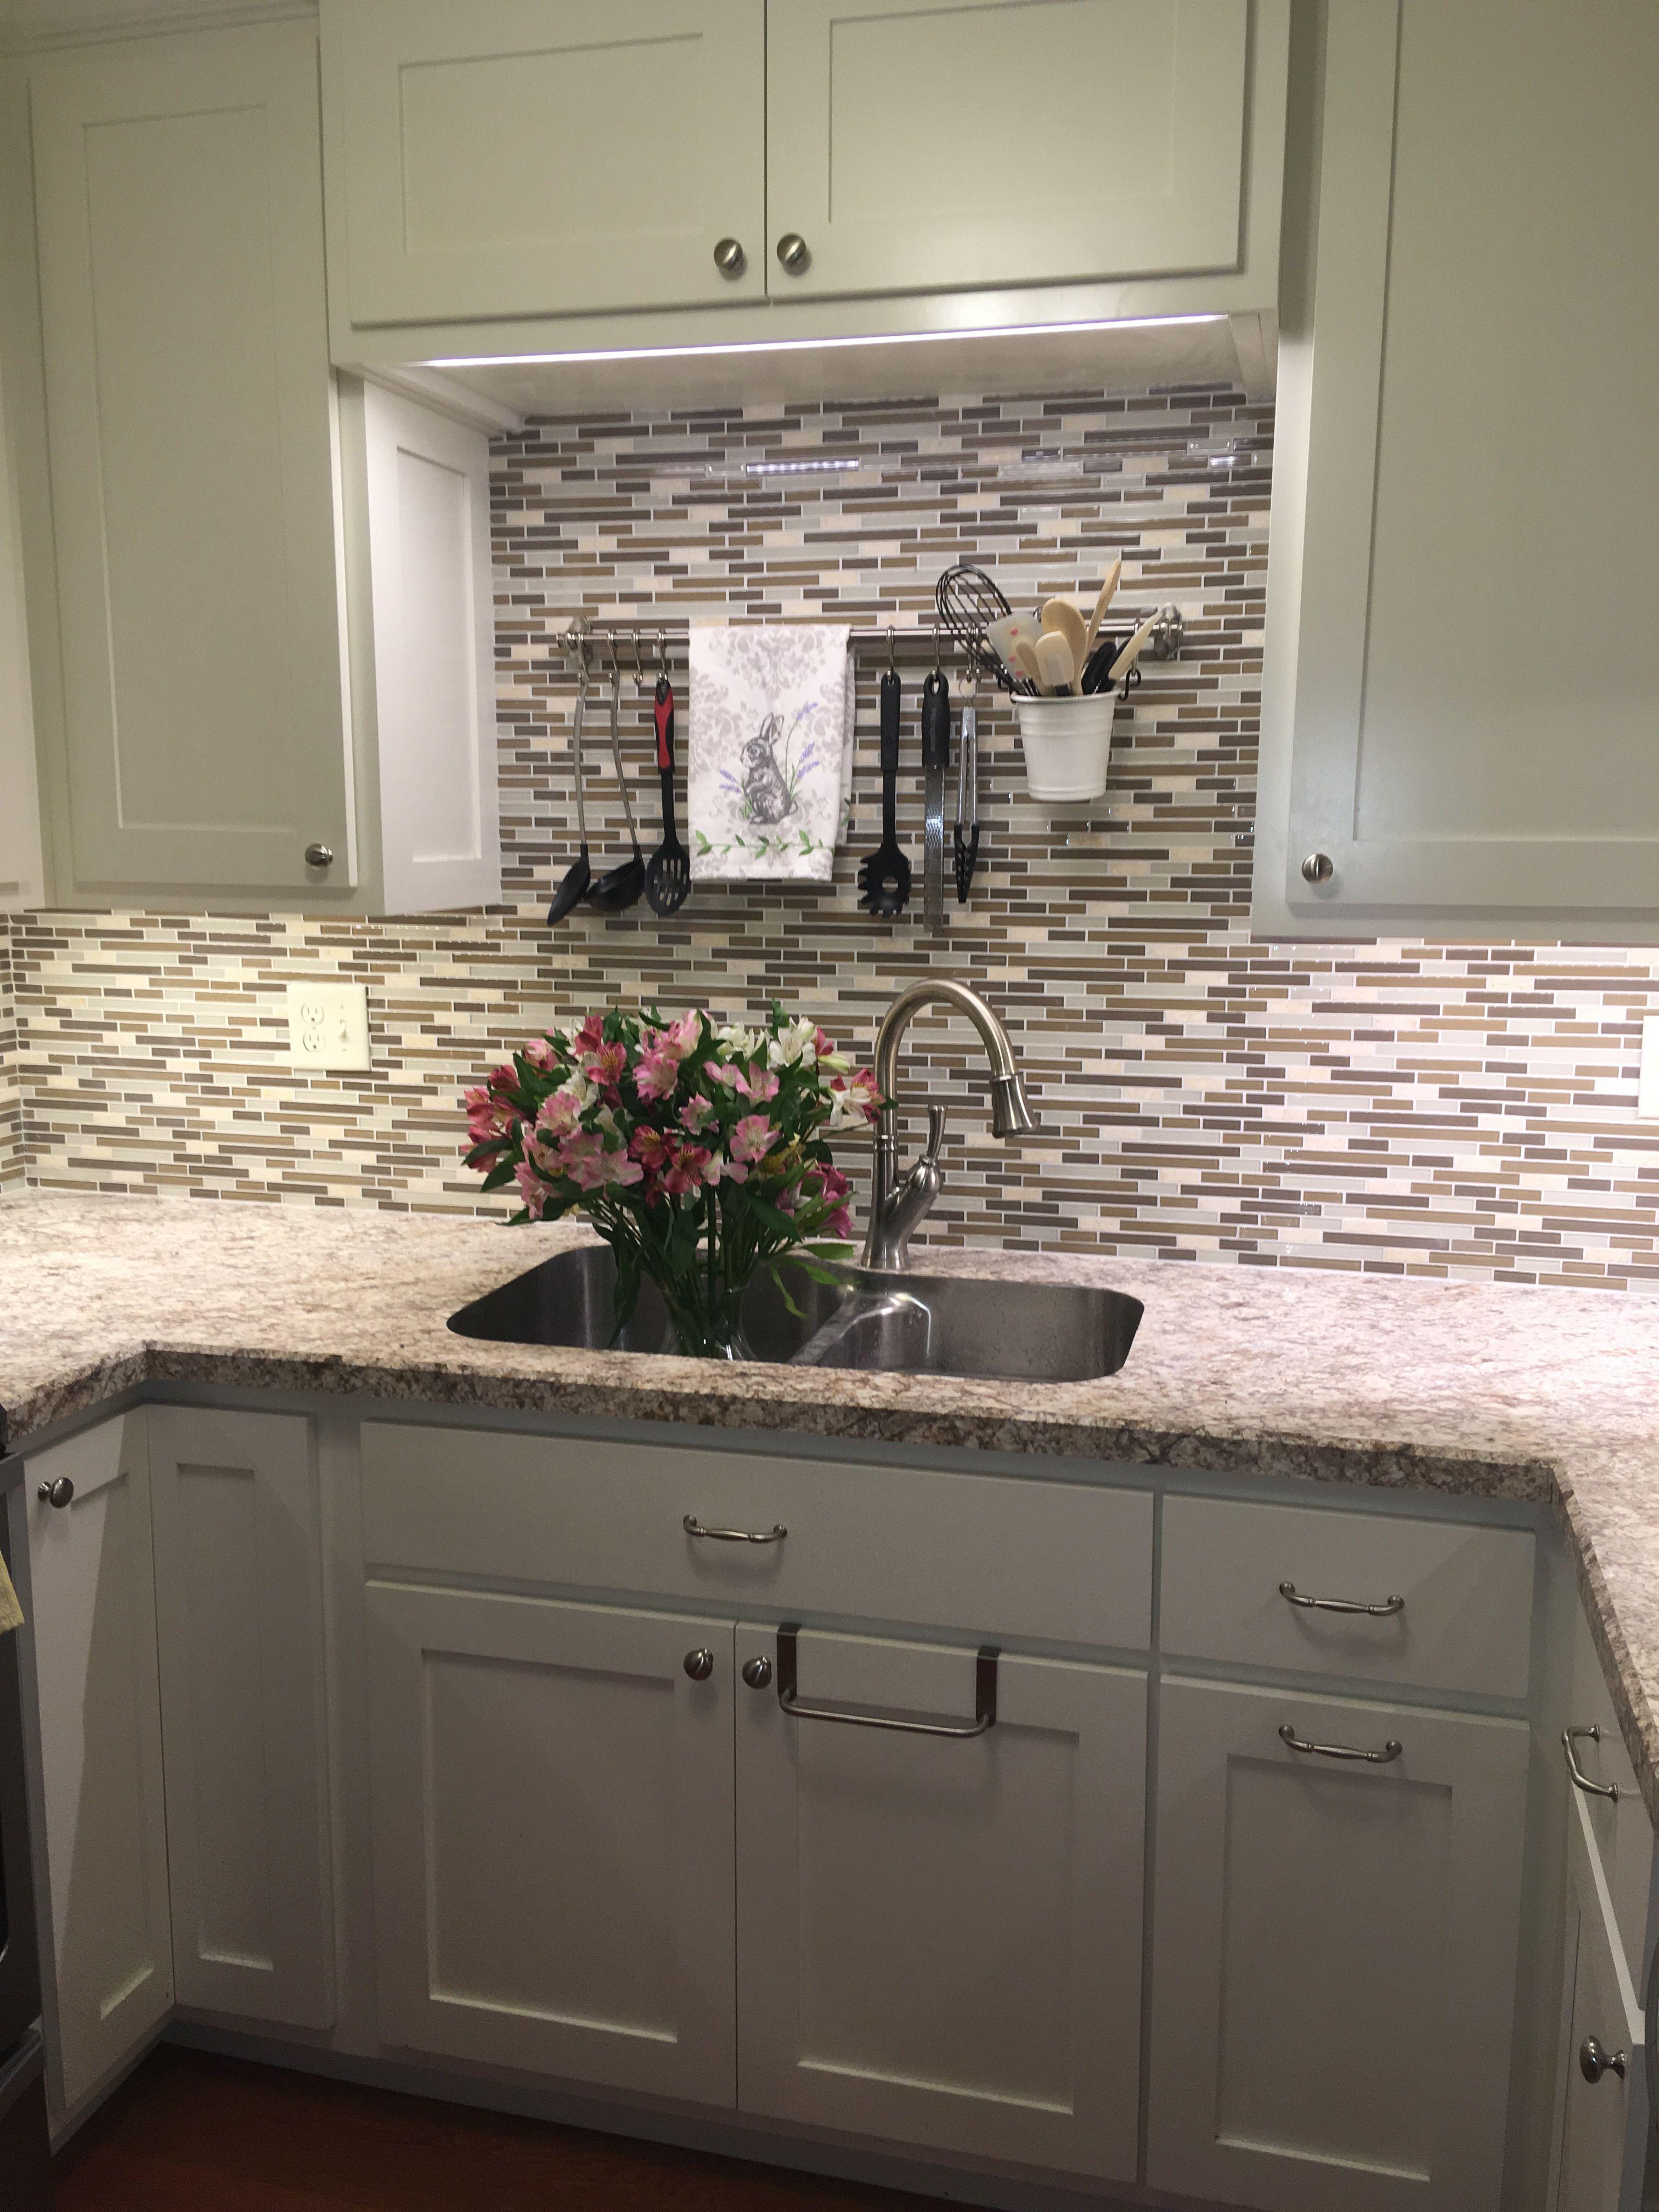 Wilsonart Bianco Romano Laminate With No Built In Backsplash And A Beveled Edge Tile Backsplash From Menards Kitchen Makeover Kitchen Kitchen Cabinets